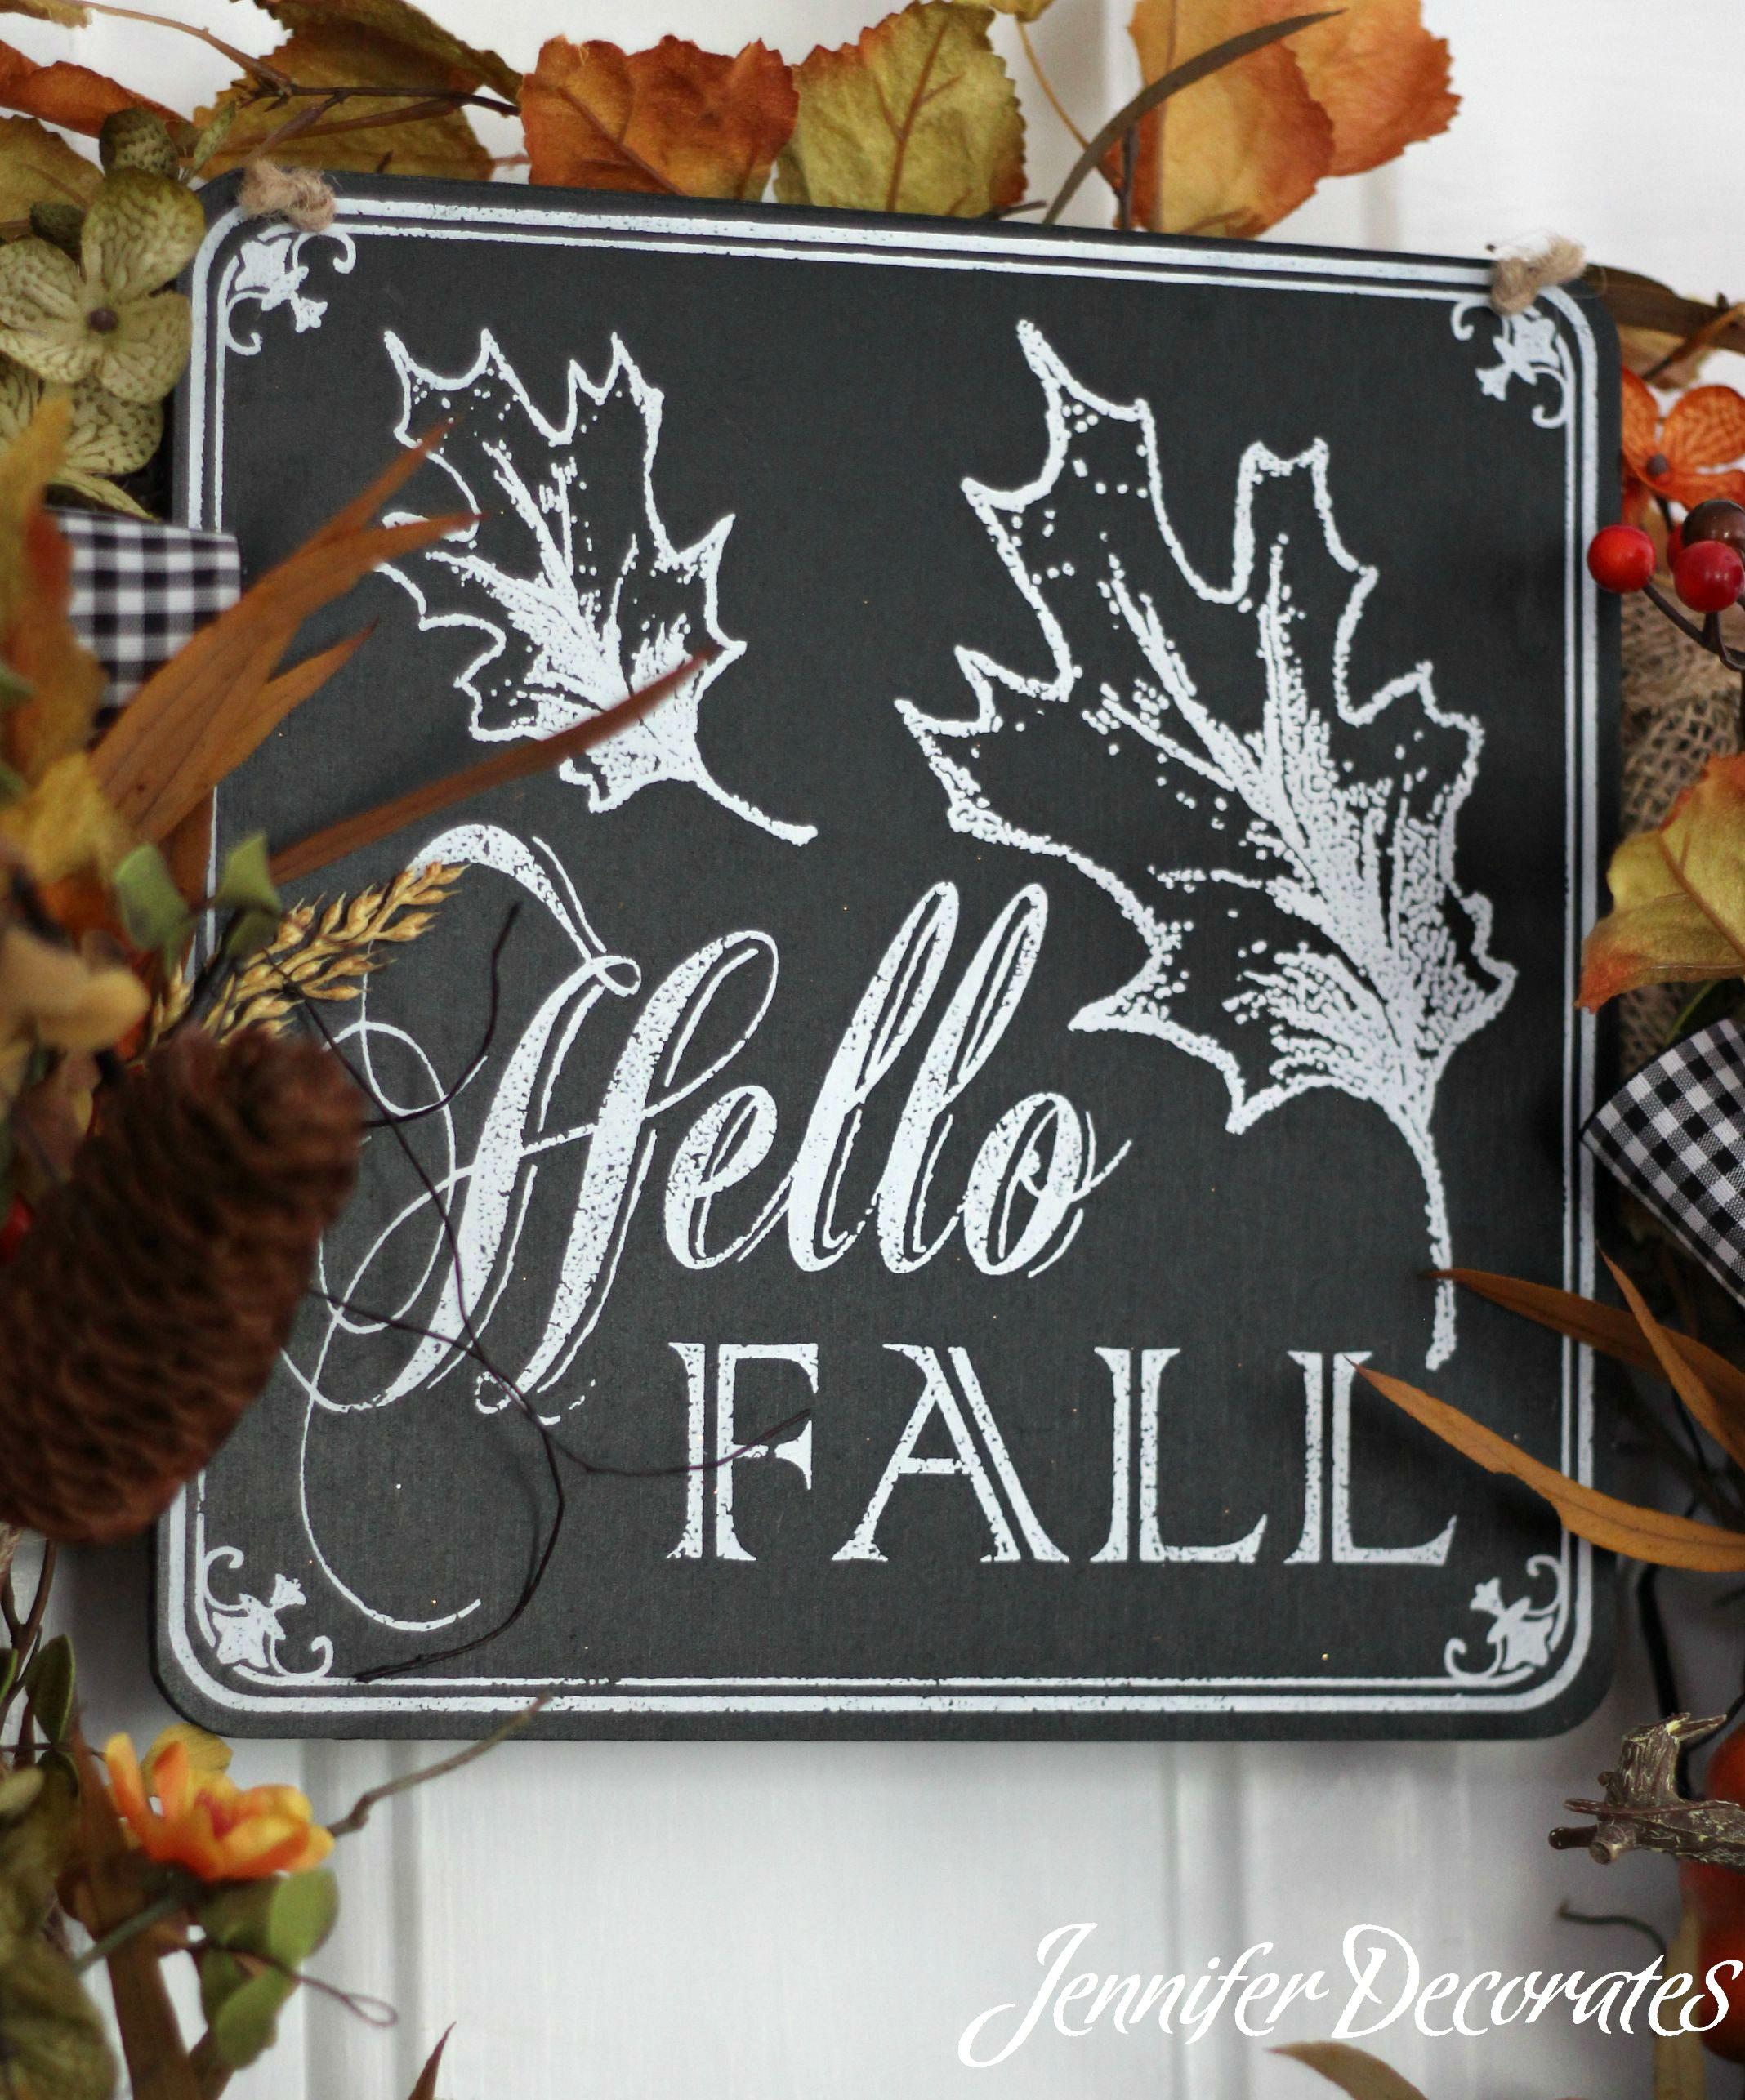 Fall wreath ideas from Jennifer Decorates.com